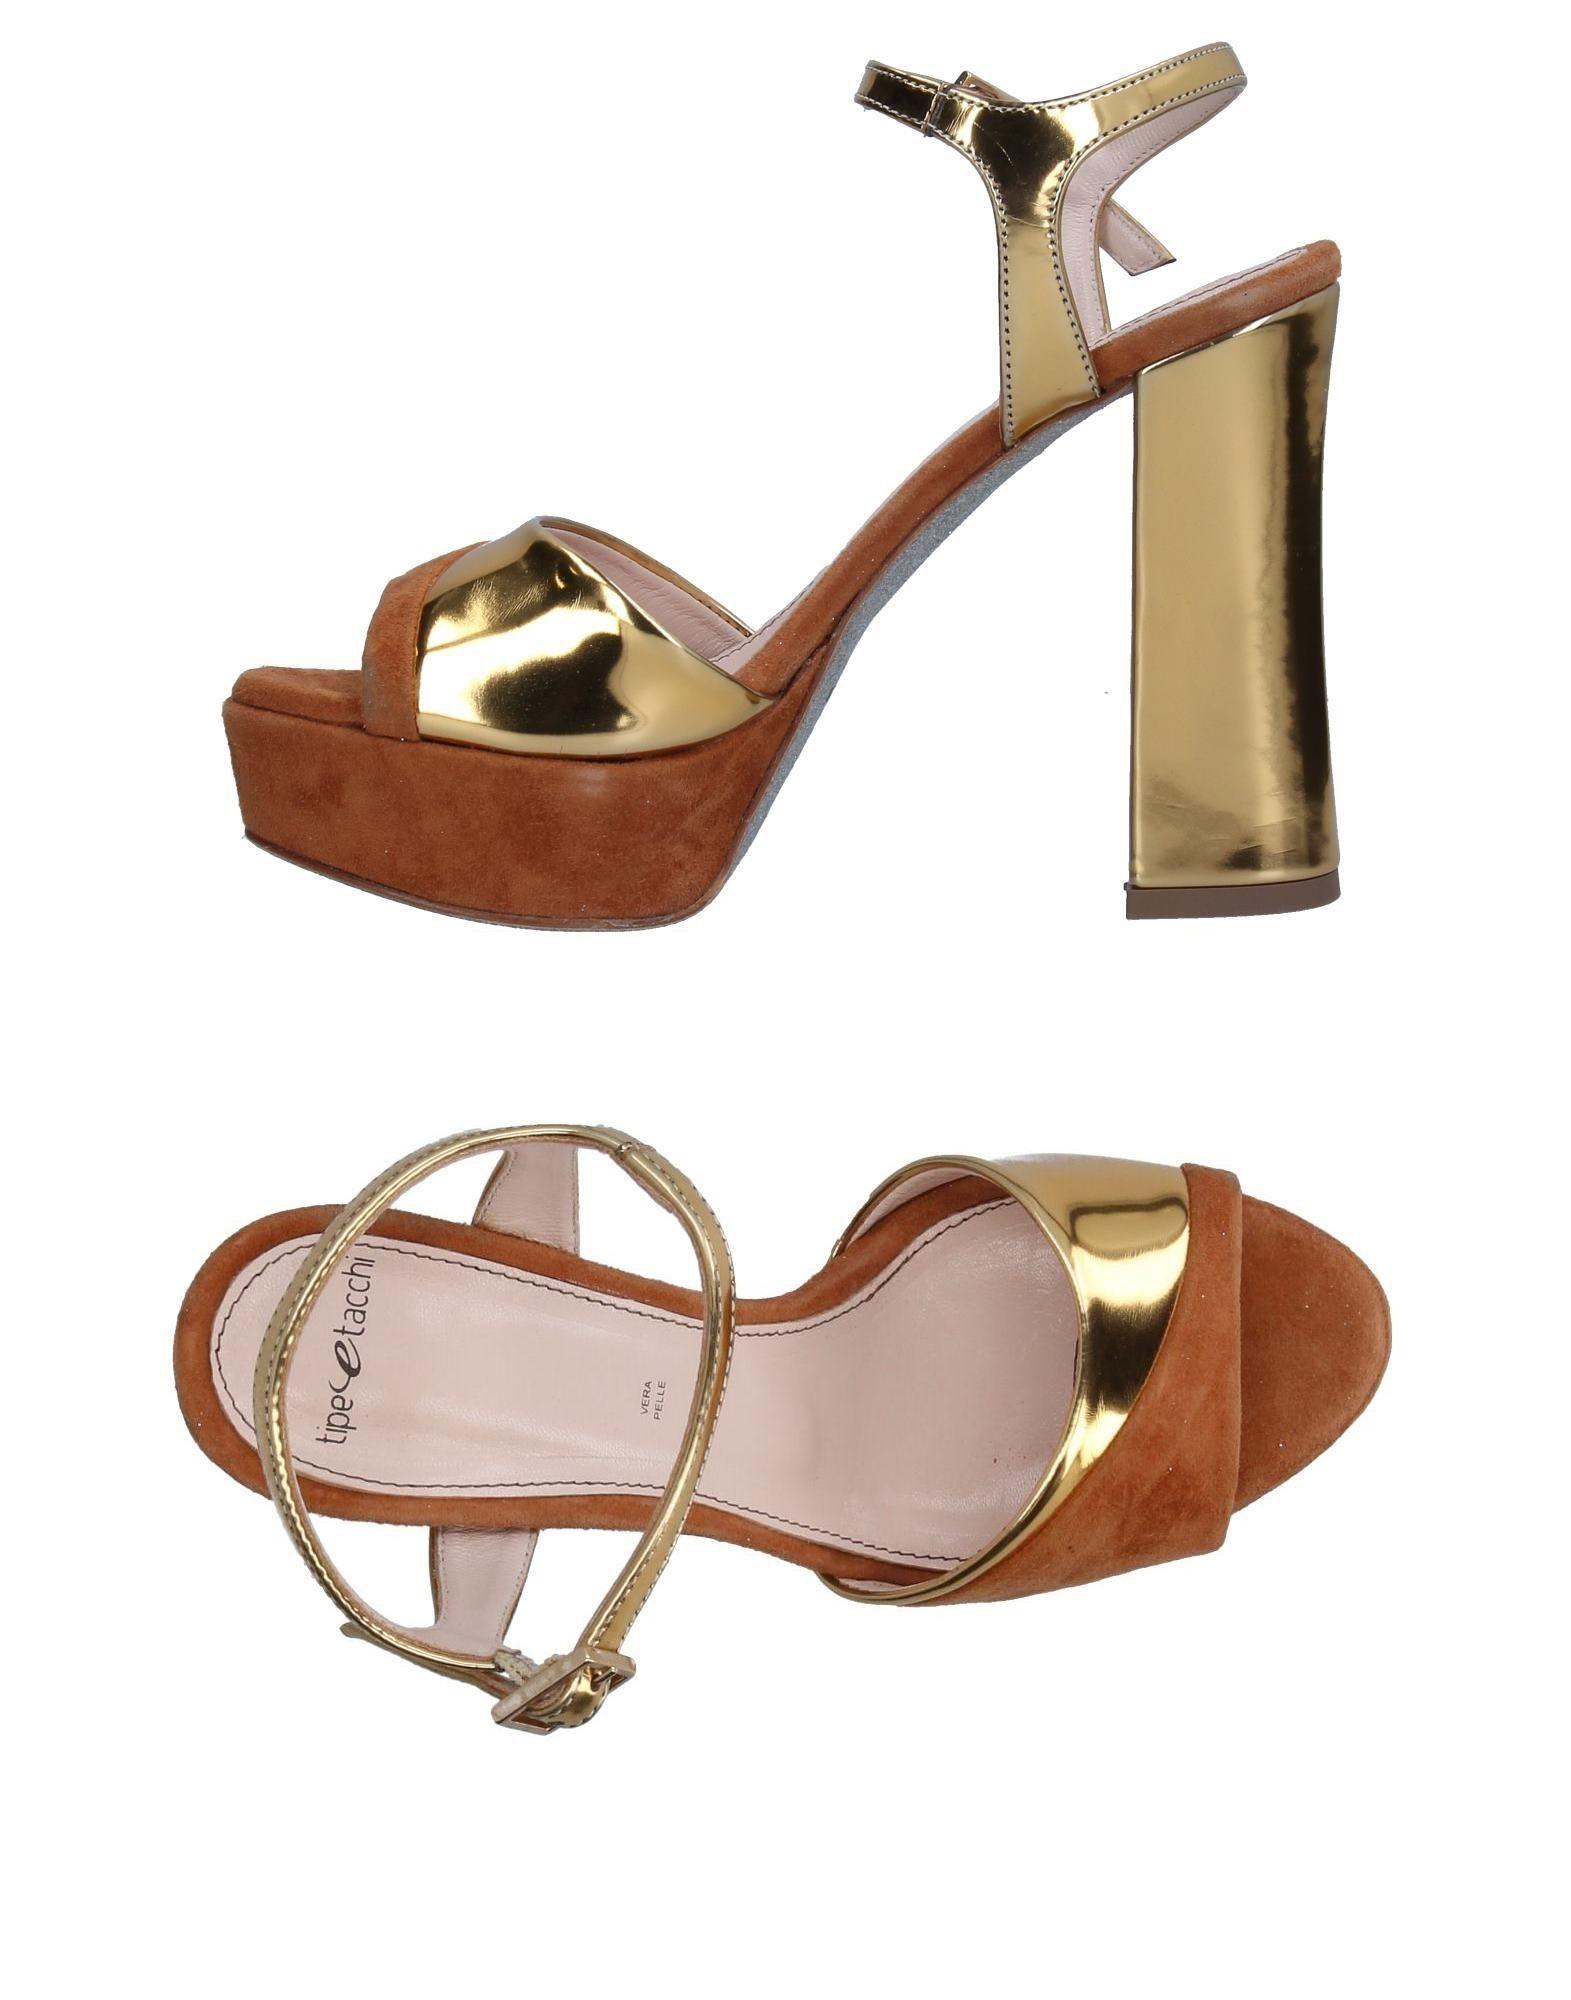 TIPE E TACCHI Damen Sandale Farbe Gold Größe 9 jetztbilligerkaufen